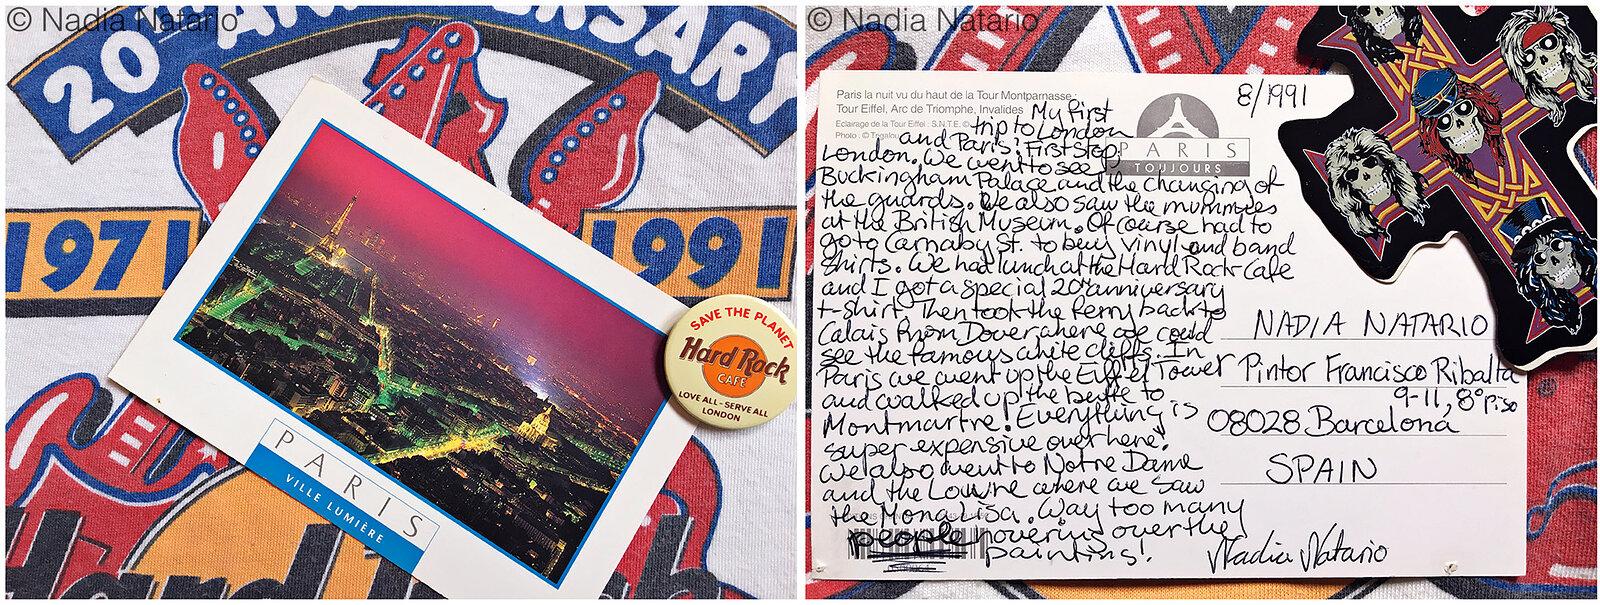 Postcards to Myself - Paris, France, 1991